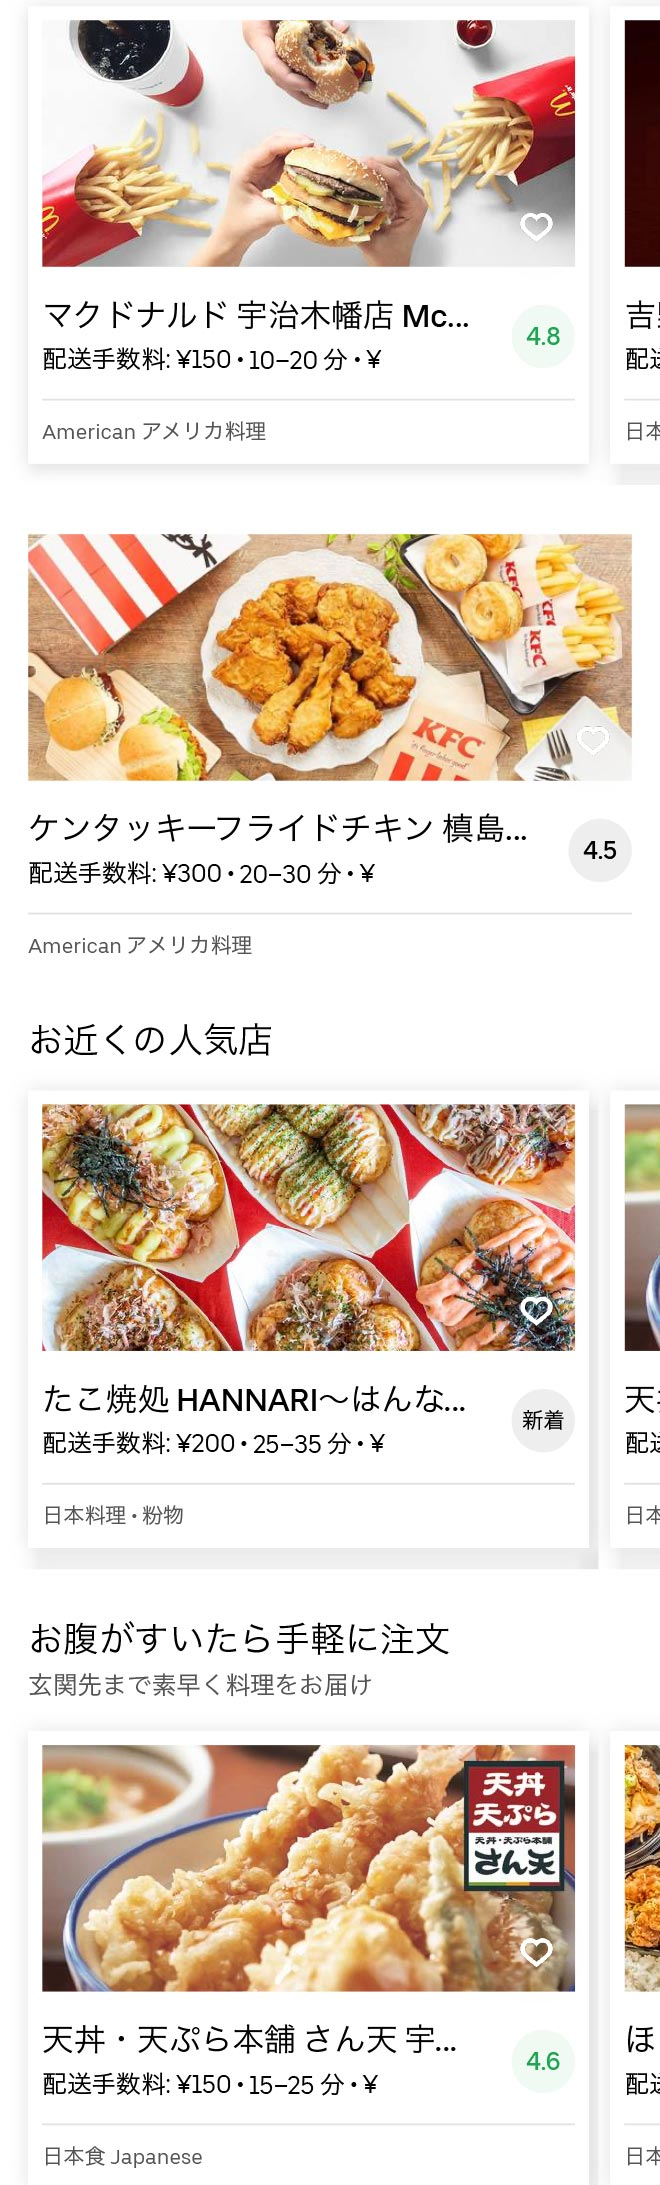 Uji rokujizo menu 2005 01